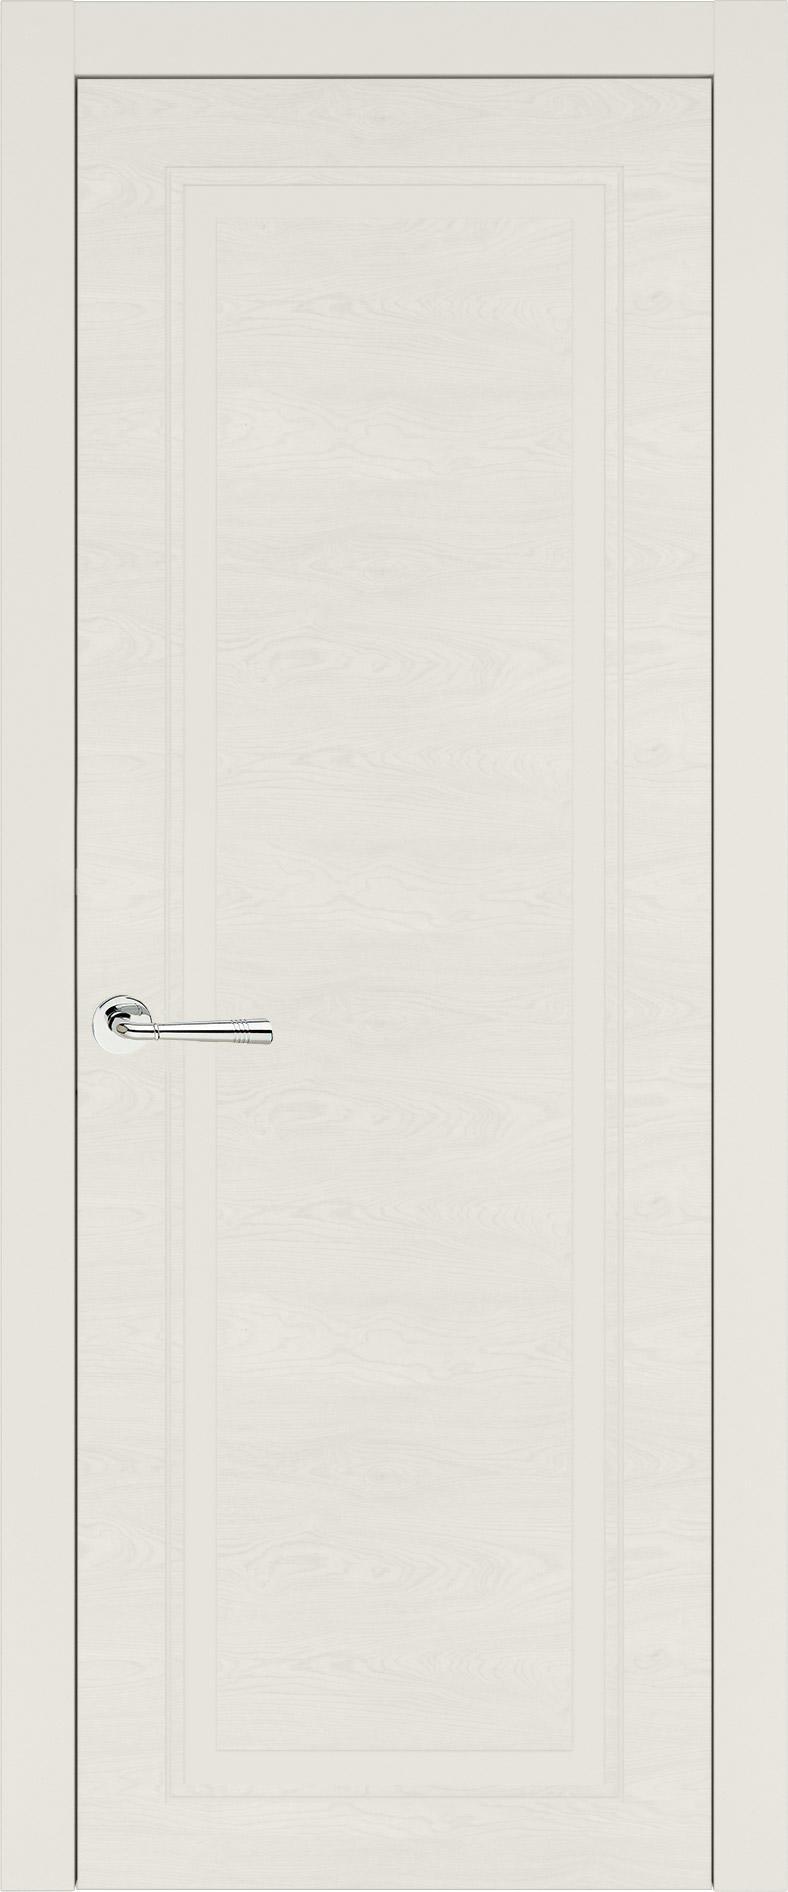 Domenica Neo Classic цвет - Бежевая эмаль по шпону (RAL 9010) Без стекла (ДГ)